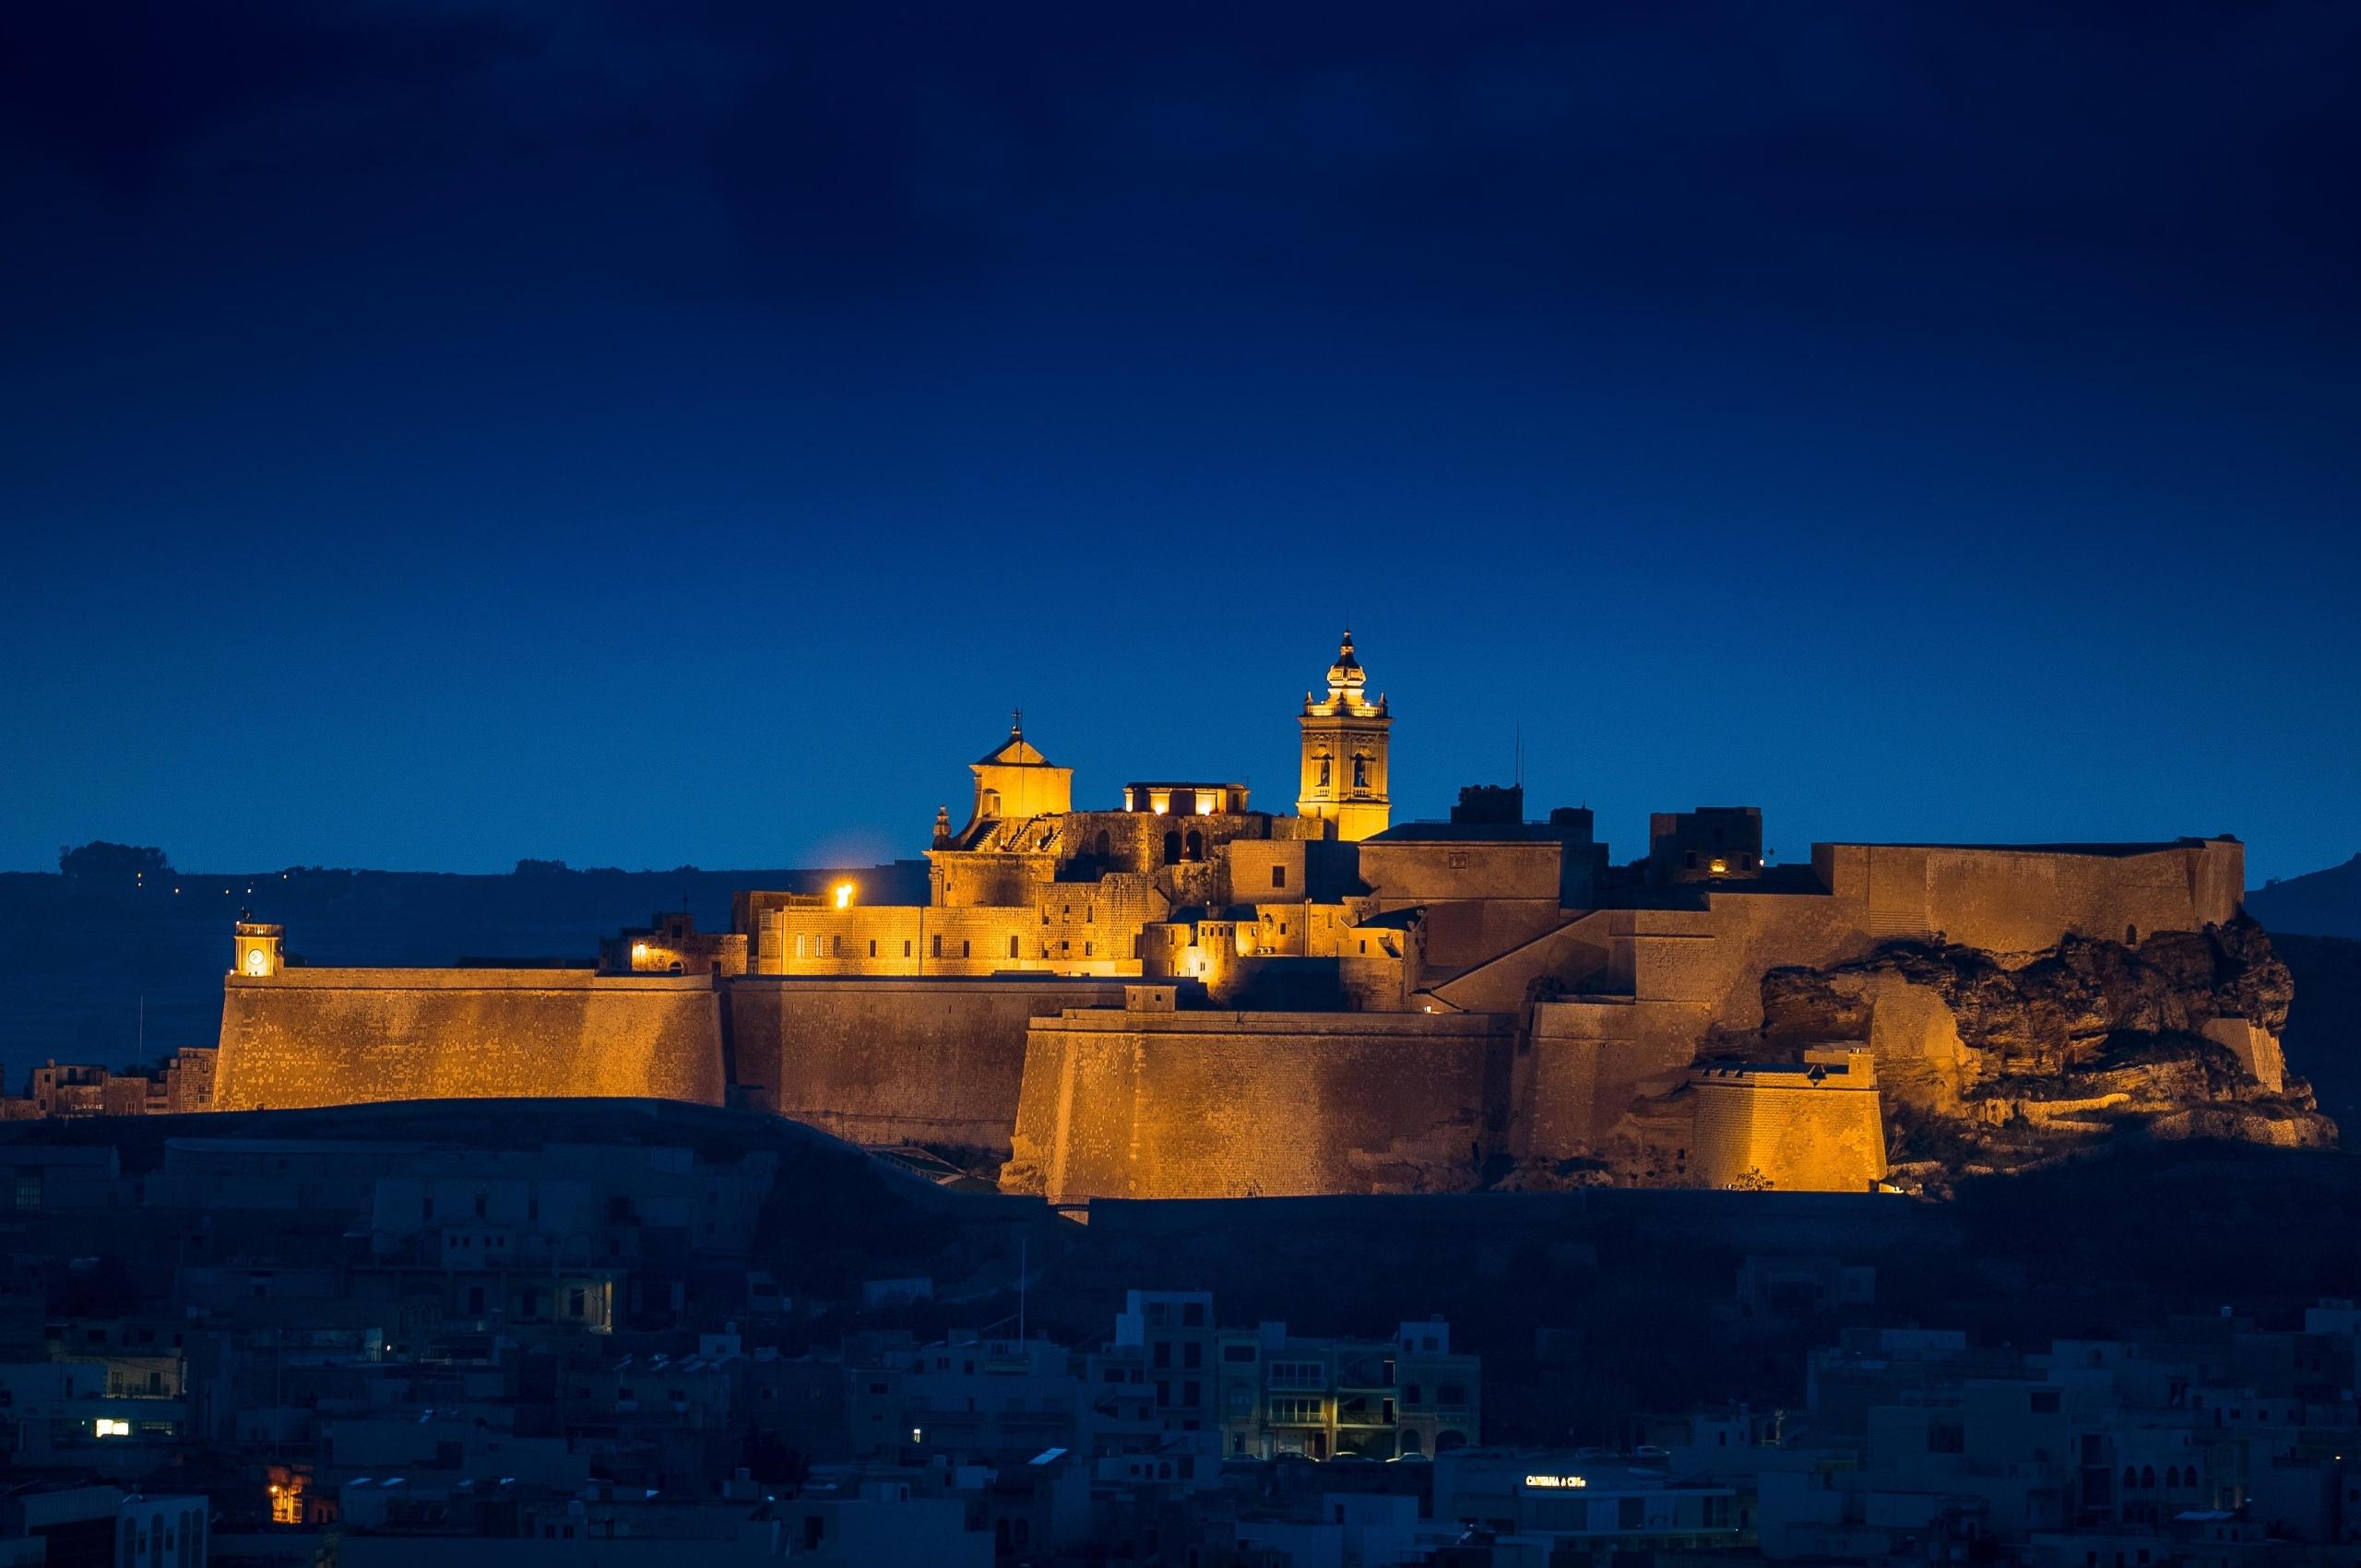 Citadel of Victoria the Island of Gozo 4K Wallpaper in 2560x1700 Resolution